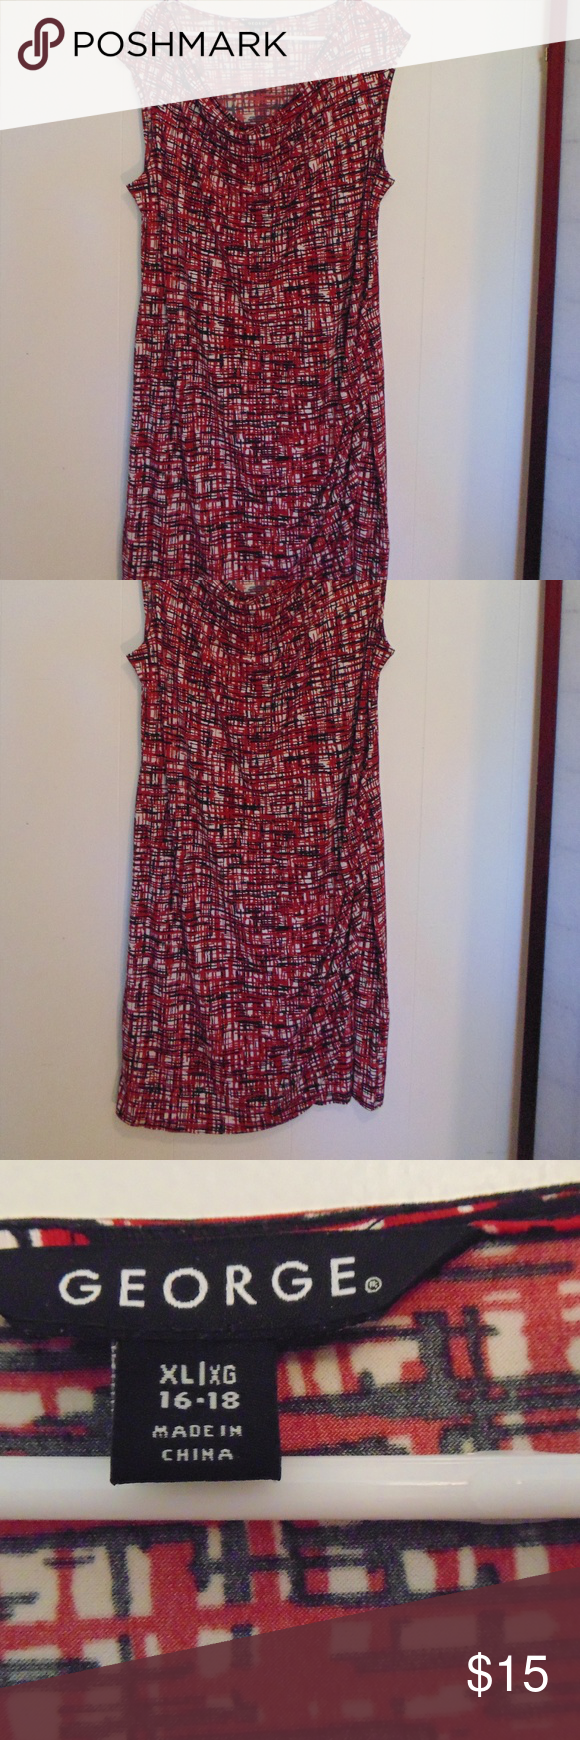 Red Sleeveless Summer Dress Sleeveless Dress Summer Summer Dresses Dresses [ 1740 x 580 Pixel ]